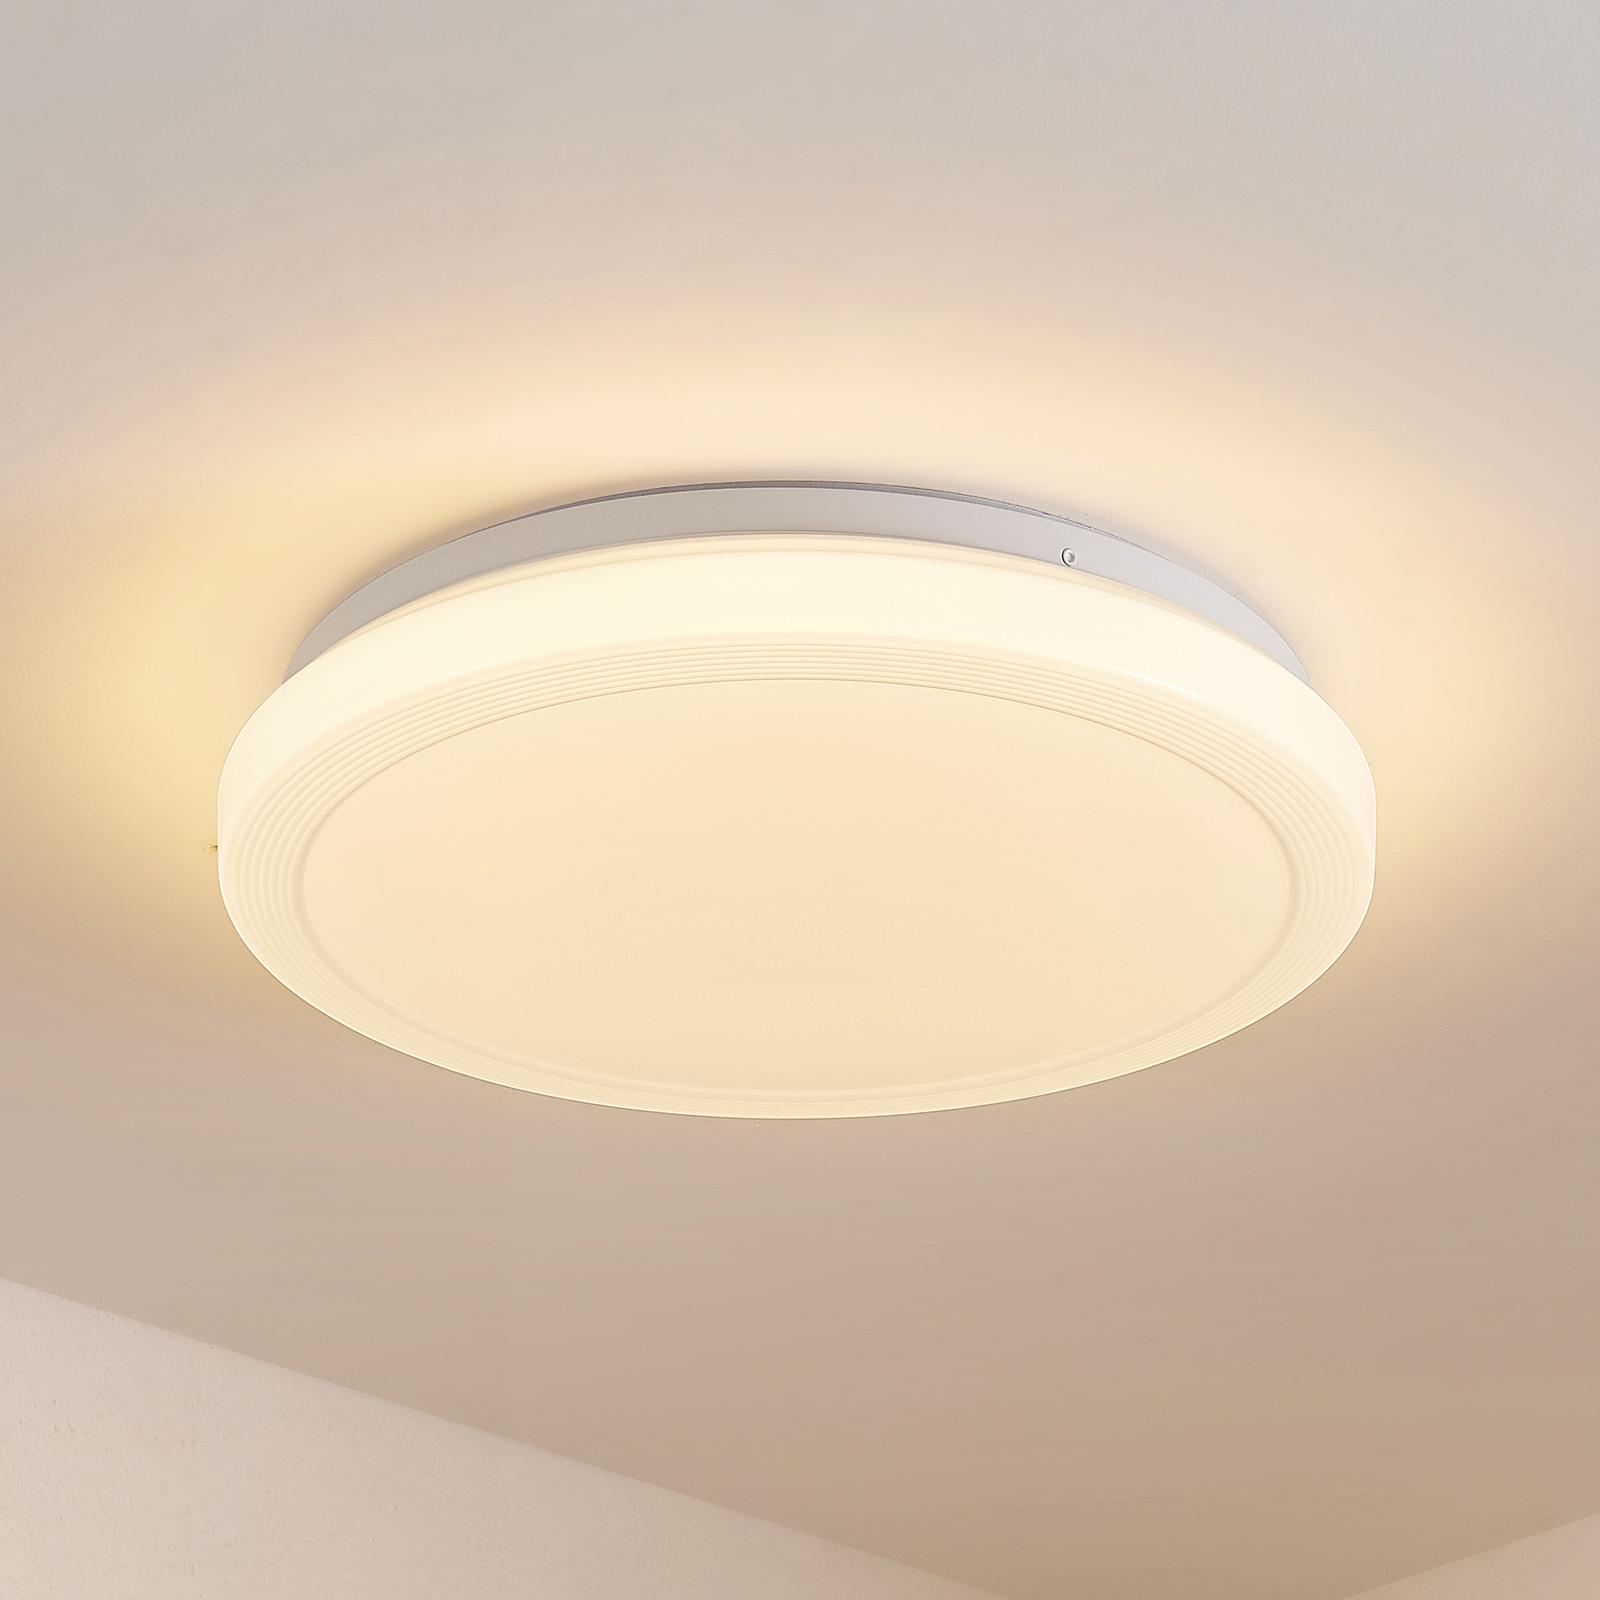 Lindby Dimano lampa sufitowa LED